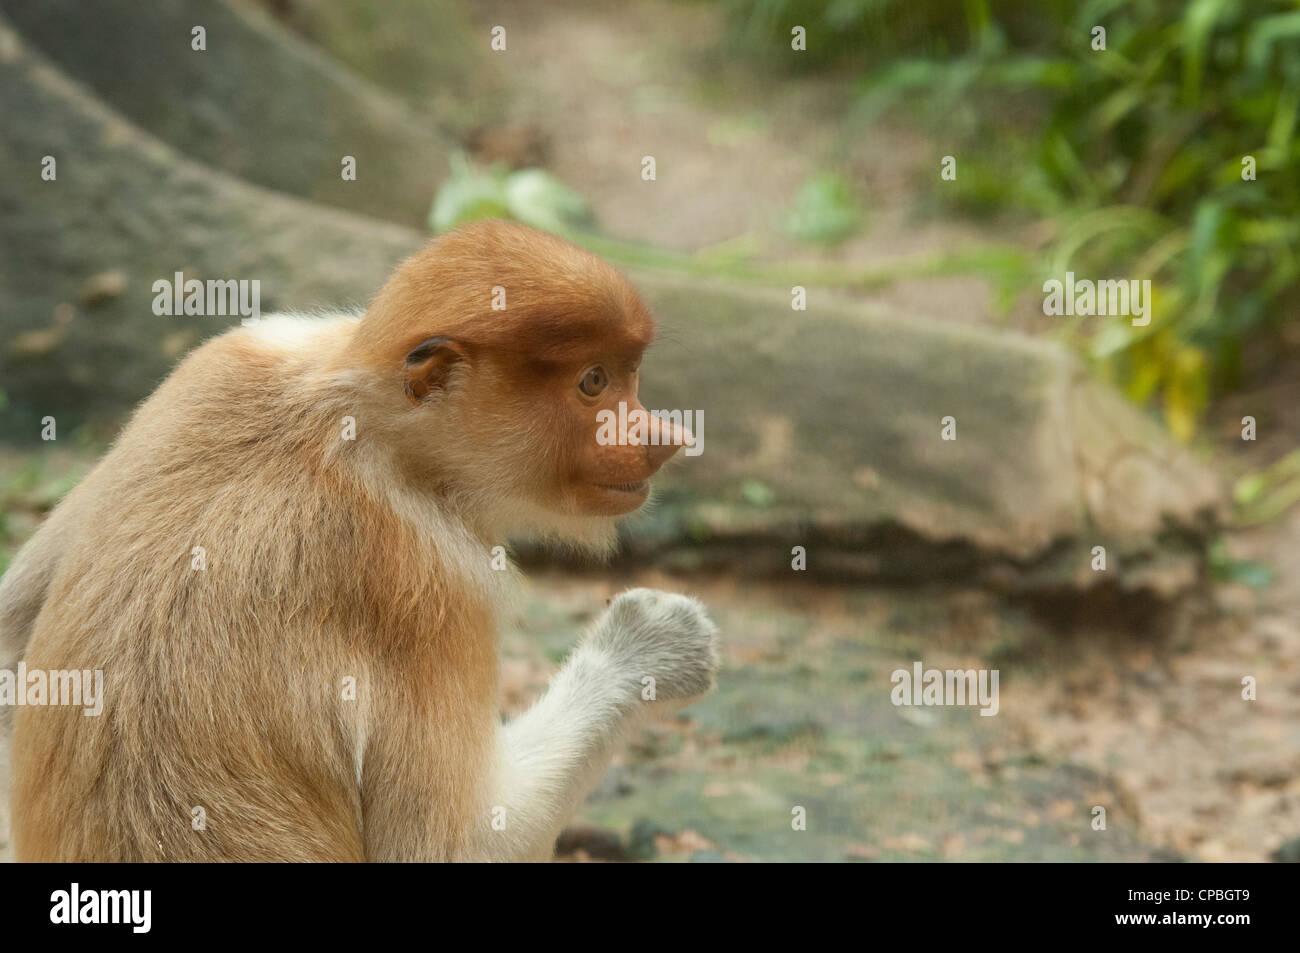 Malaysia, Island of Borneo, Sabah, Kota Kinabalu, Lok Kawi Wildlife Park. Proboscis monkey - Stock Image